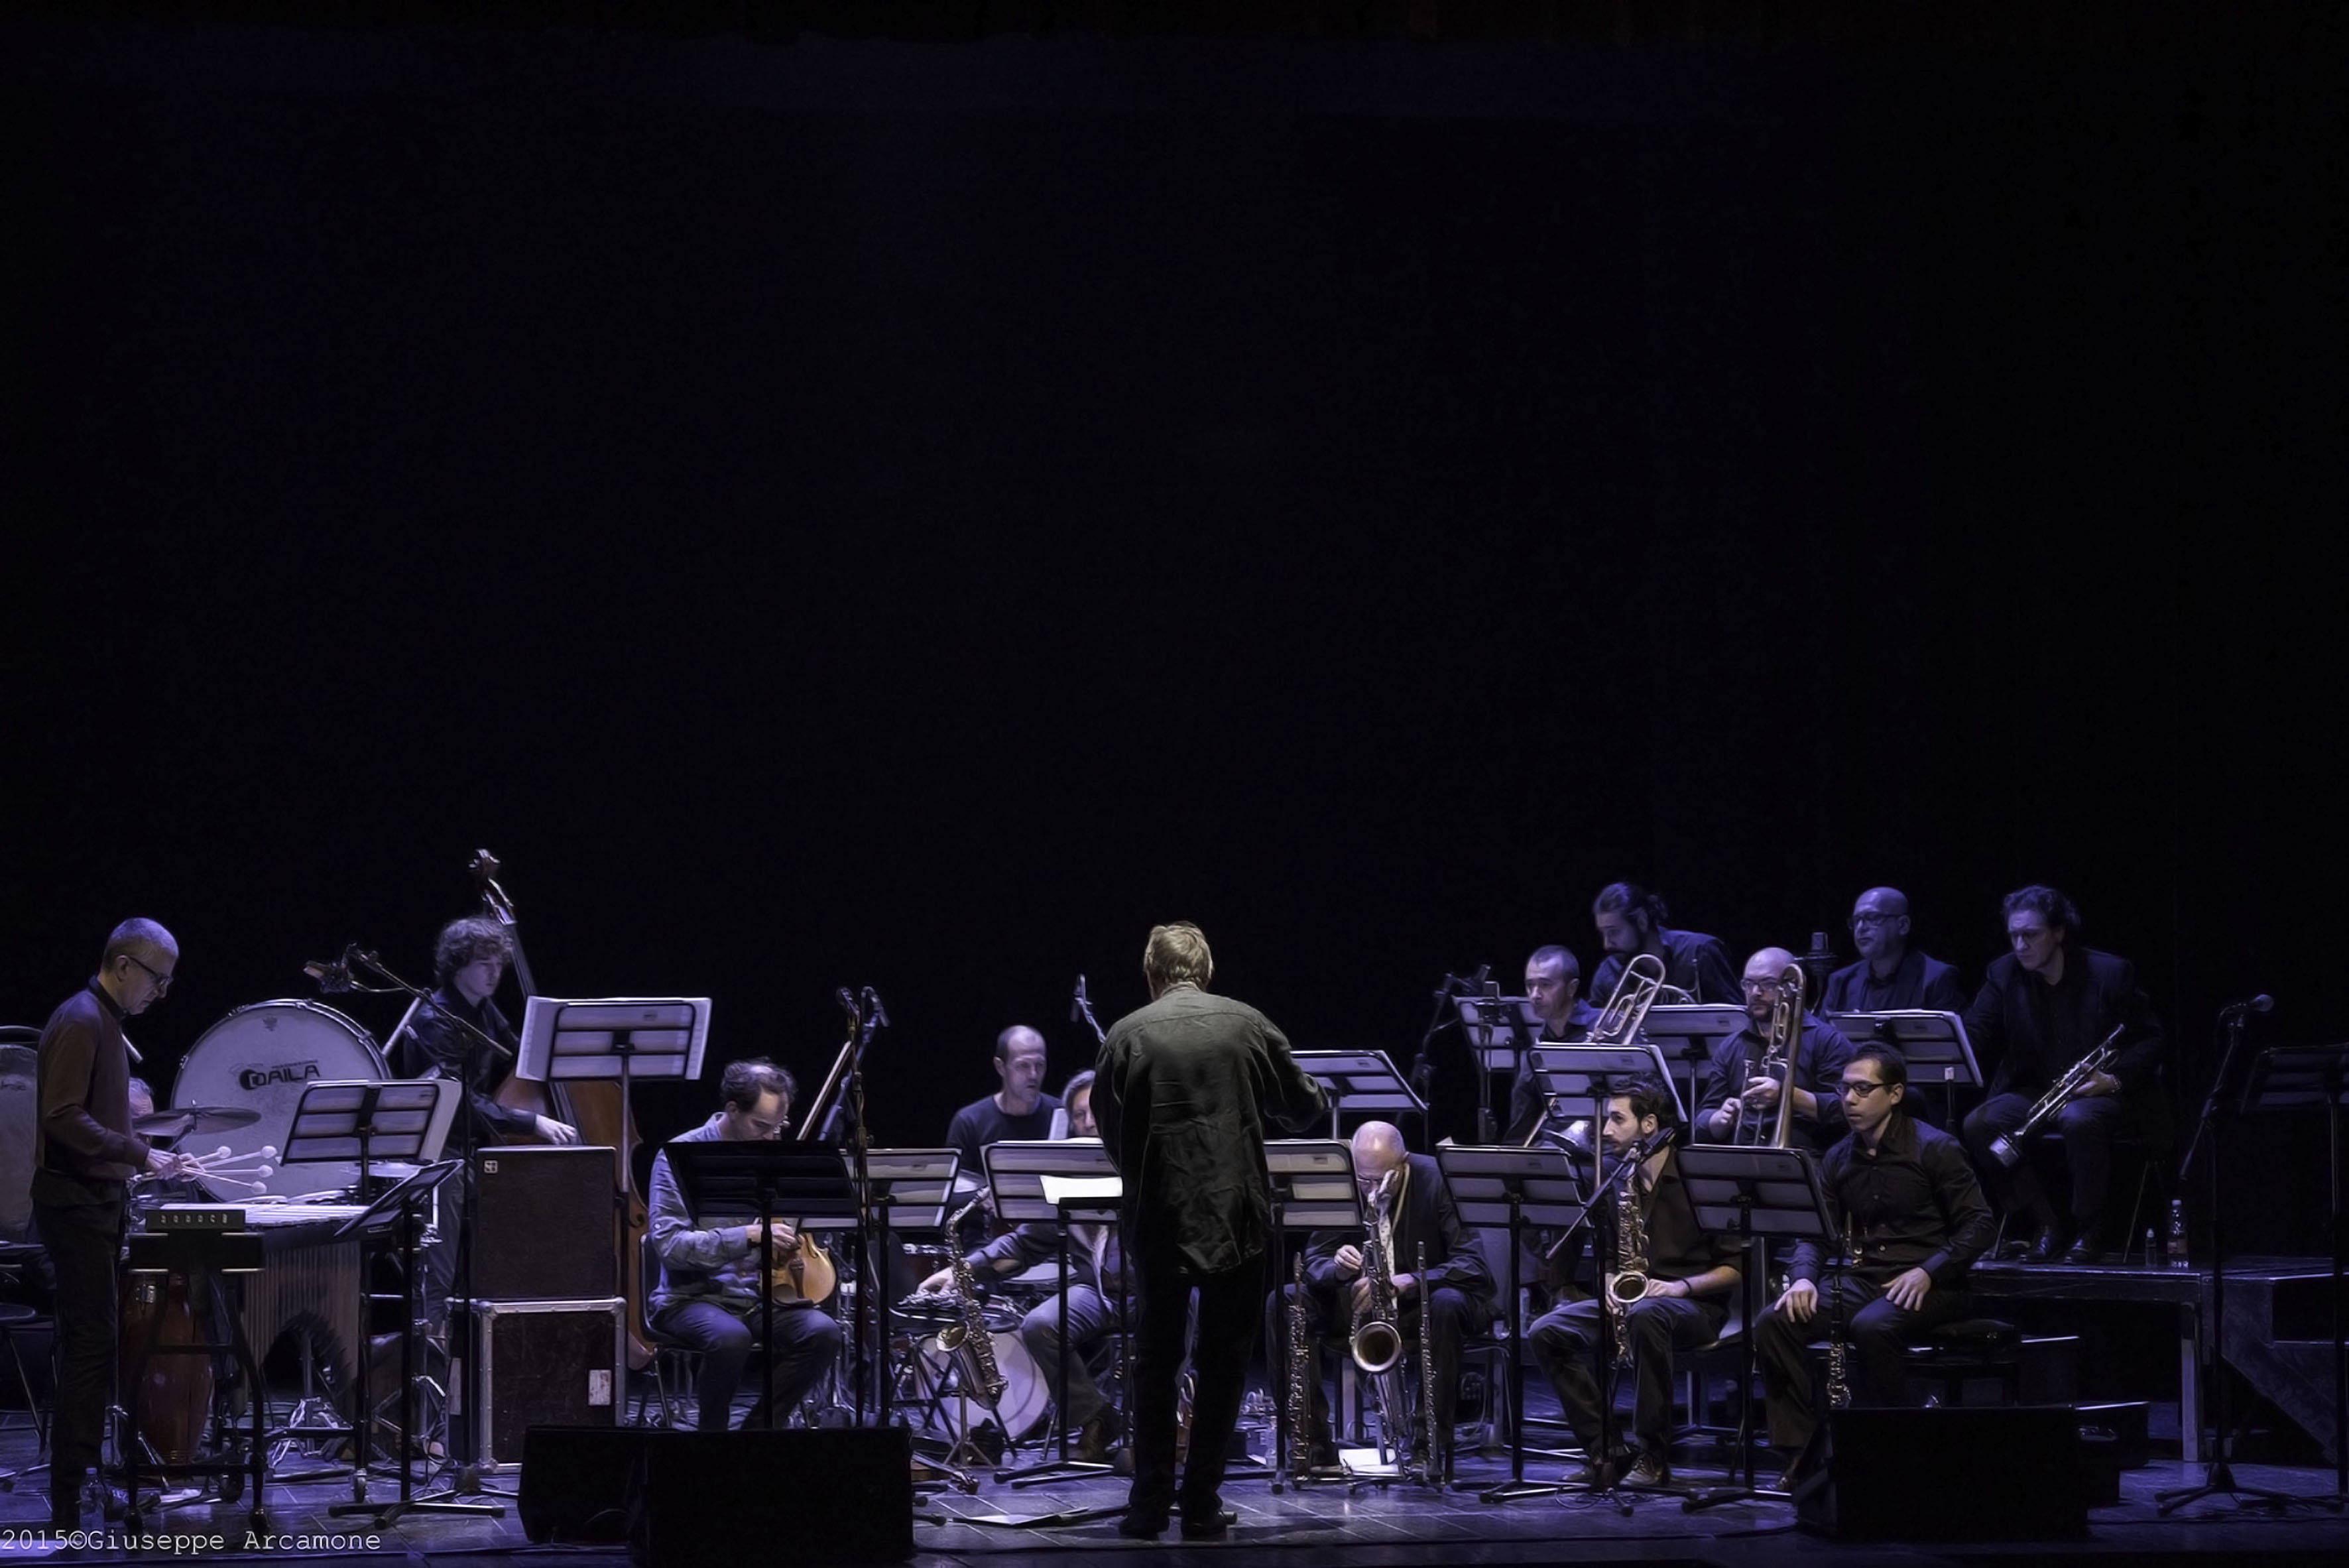 Parma Jazz Frontiere 2015